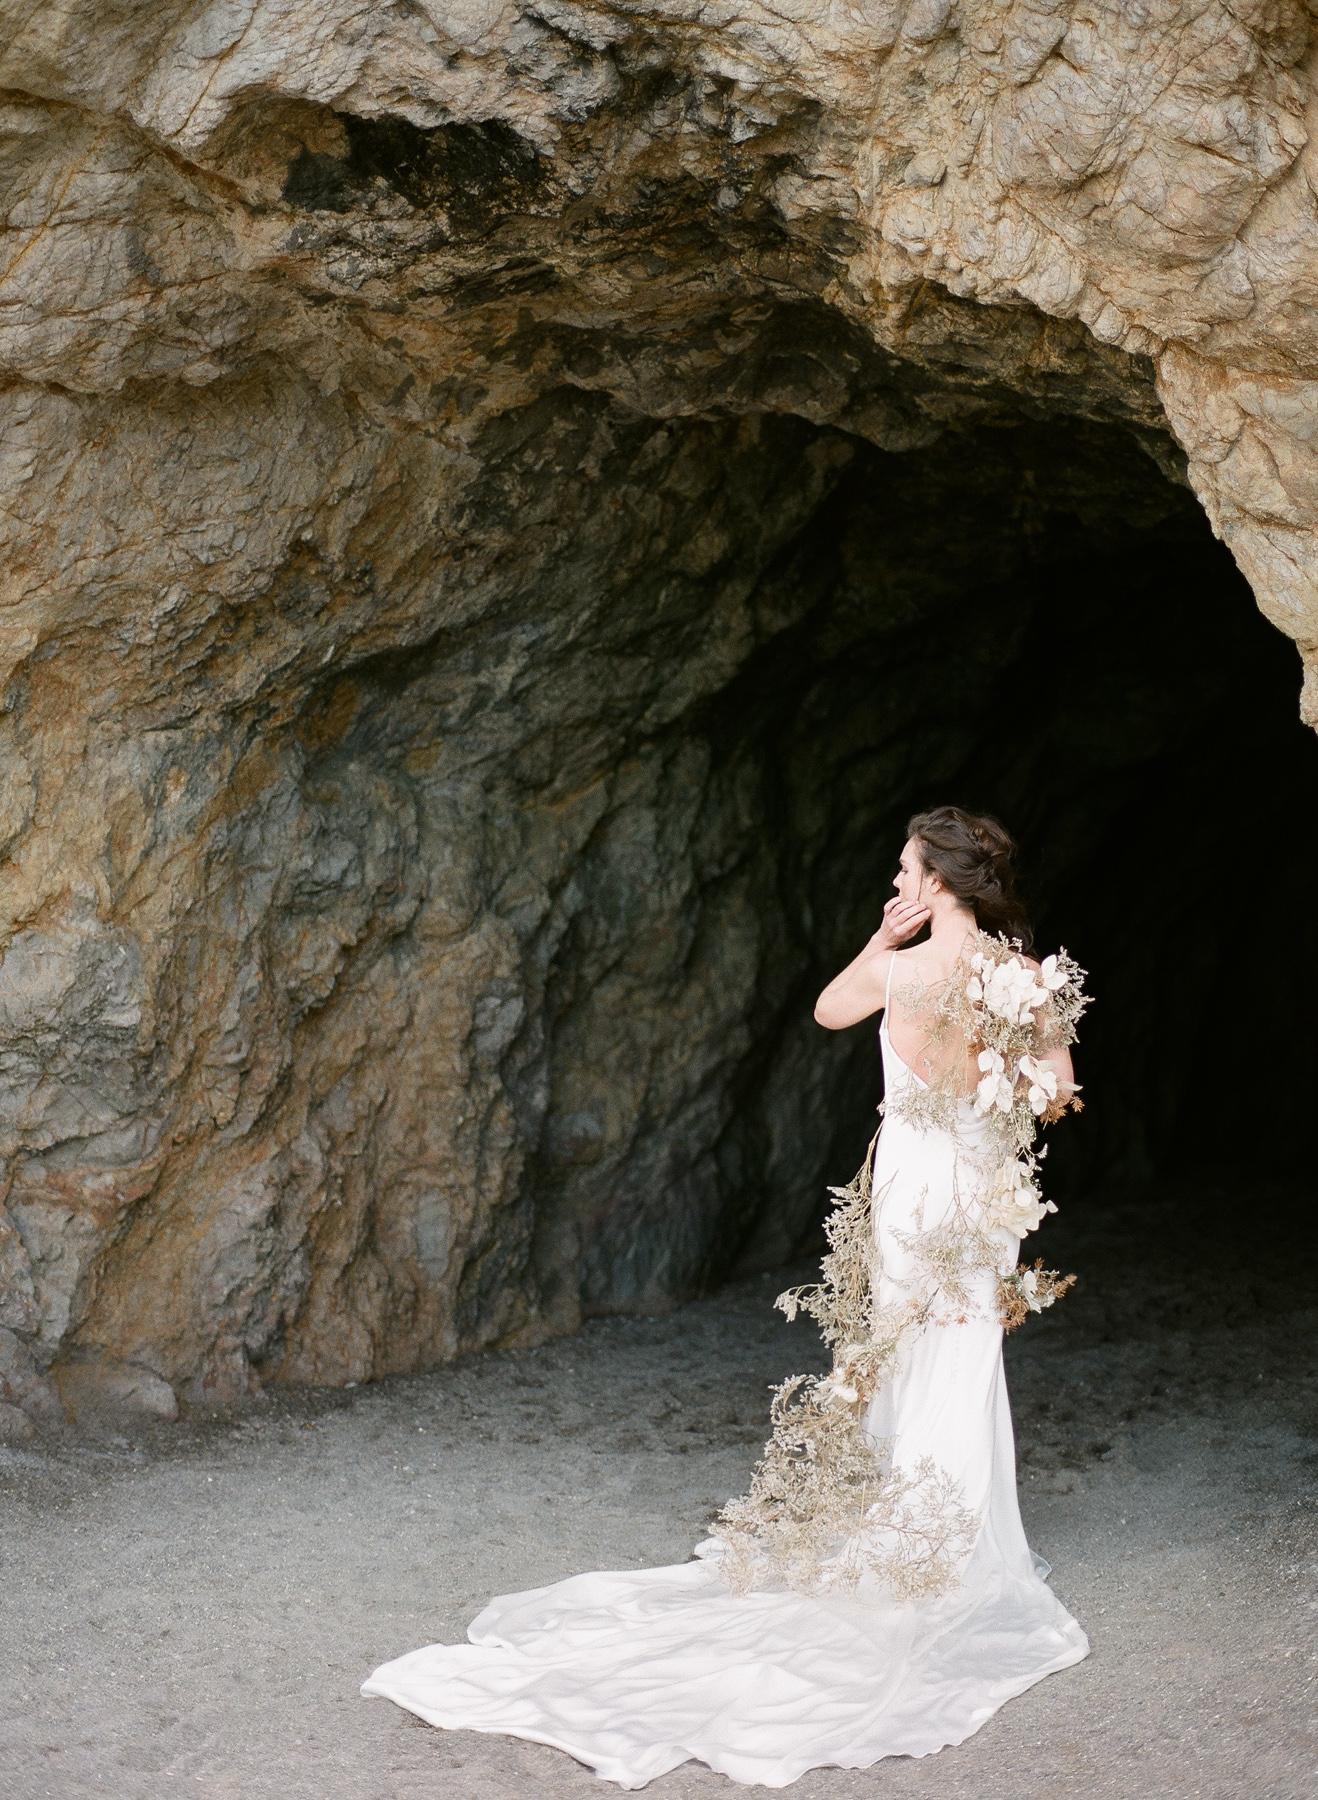 San-Francisco-Wedding-Film-Photography-29.jpg